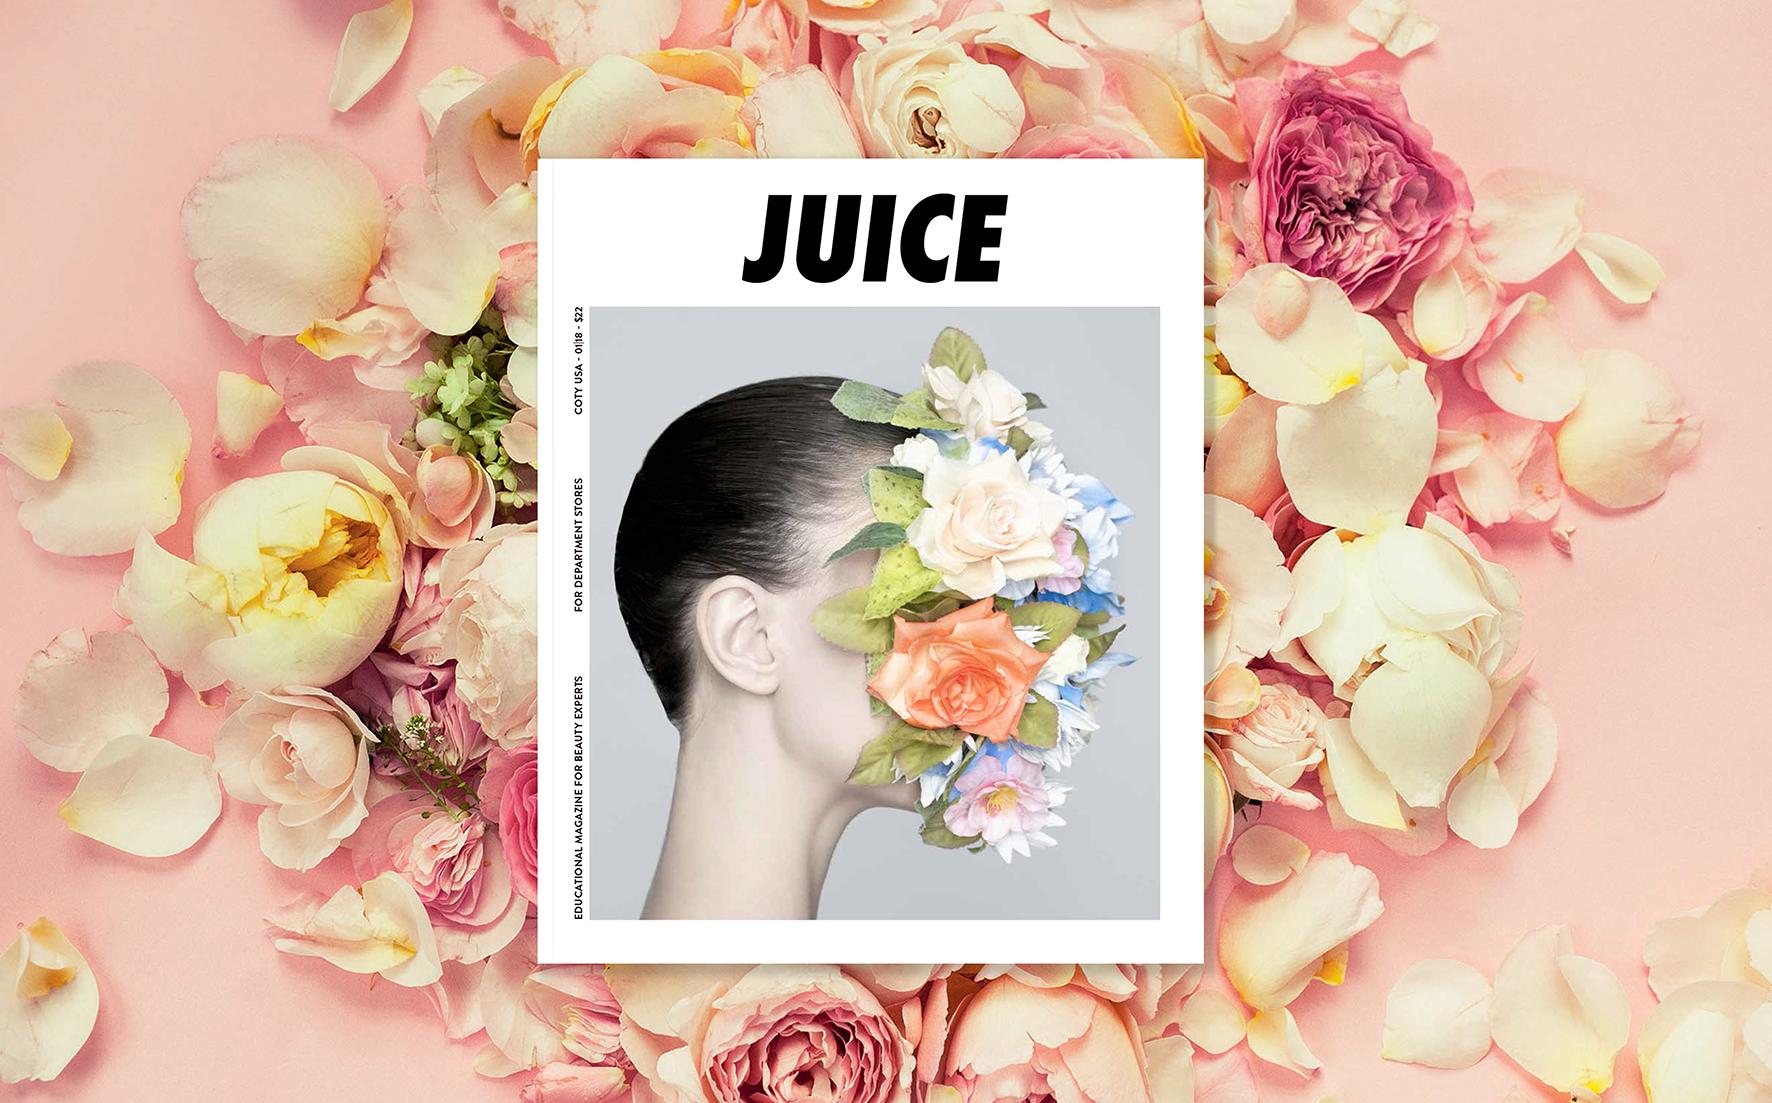 perfume_magazinecover2.jpg